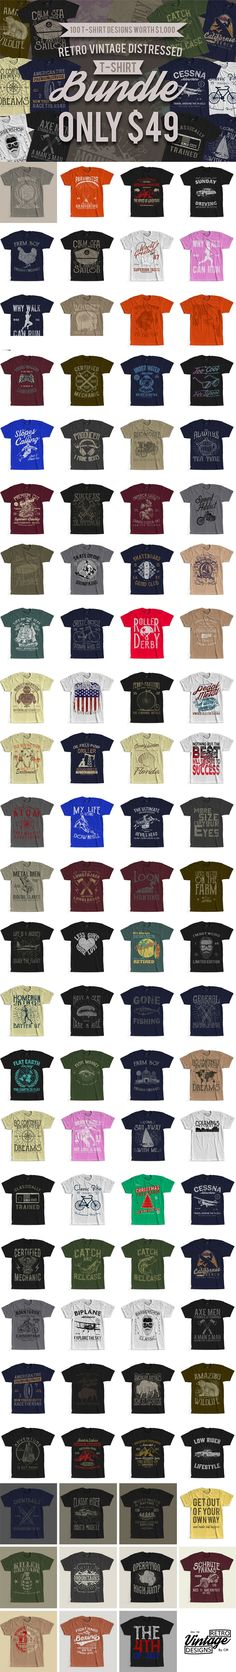 9248662b3 47 Best T-shirt Design Bundle Deals images in 2019 | Design bundles ...